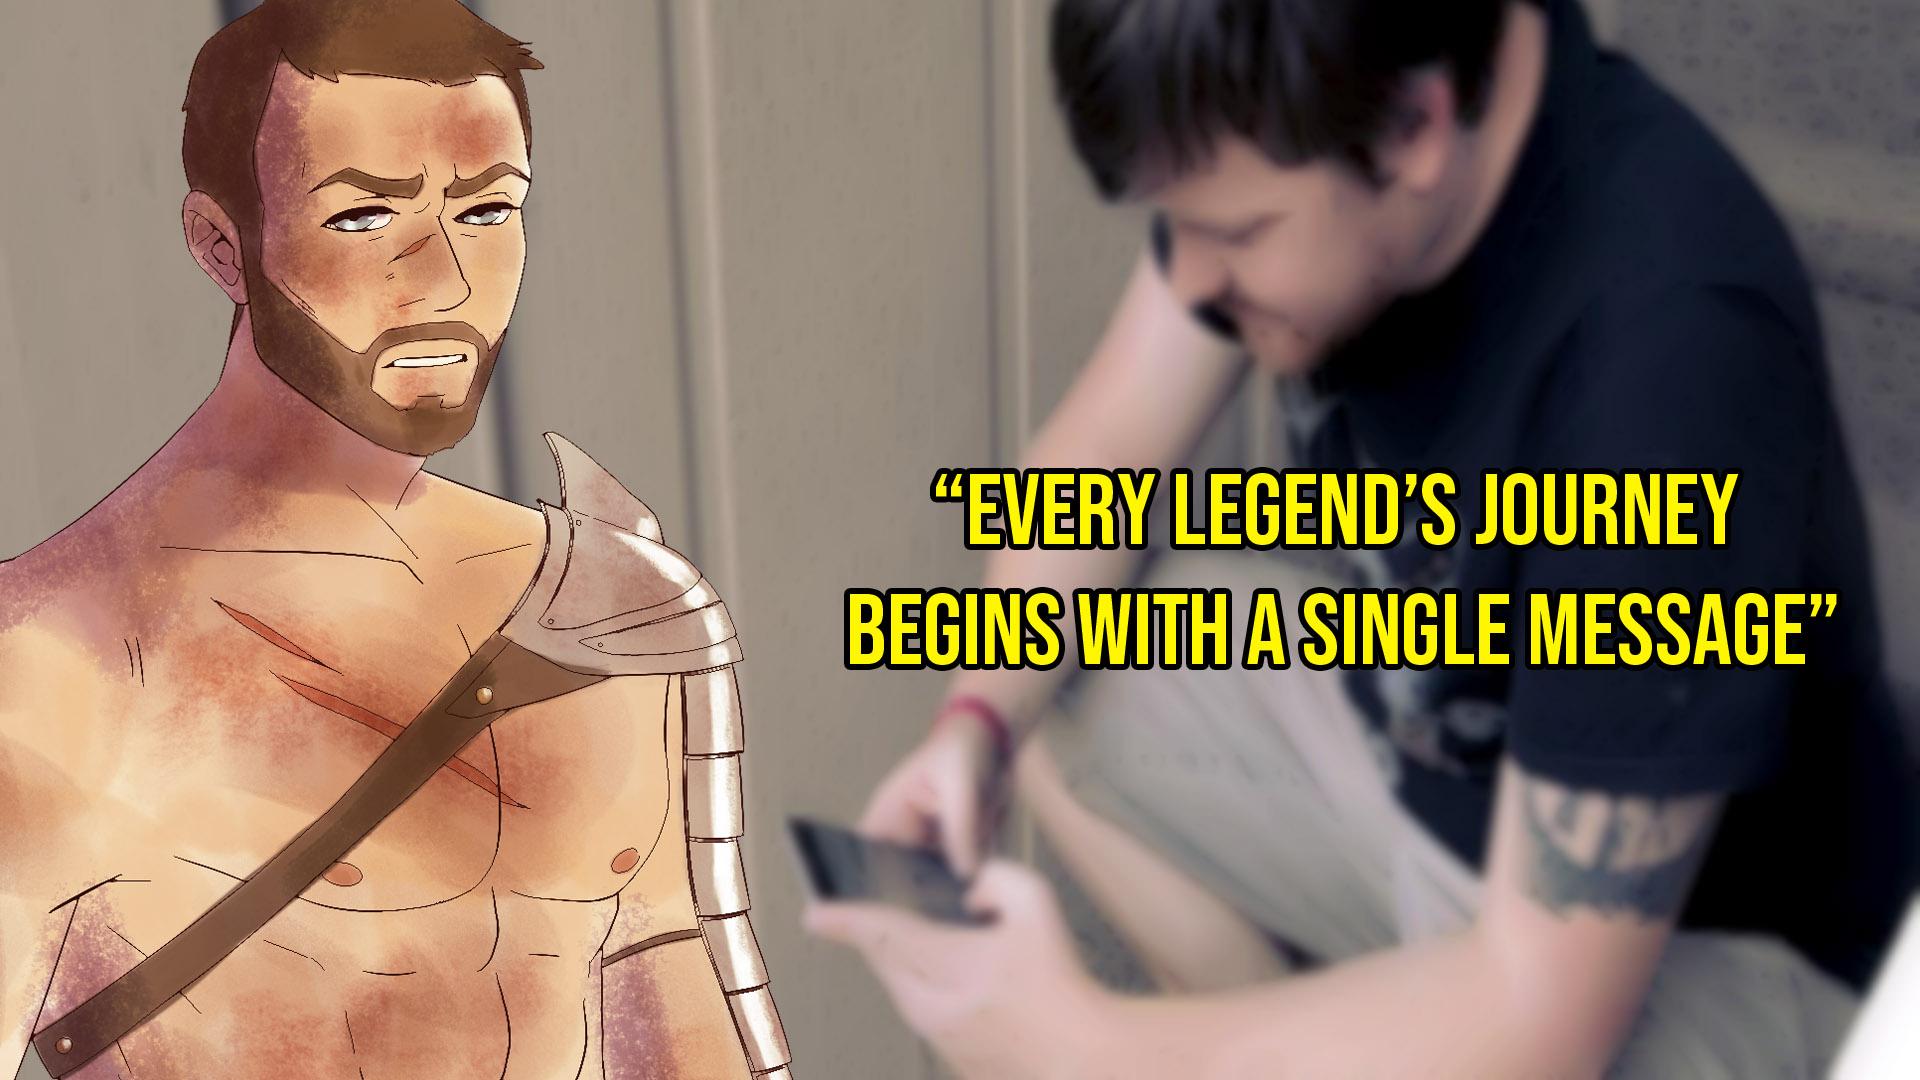 Every Legends Journey 02.jpg